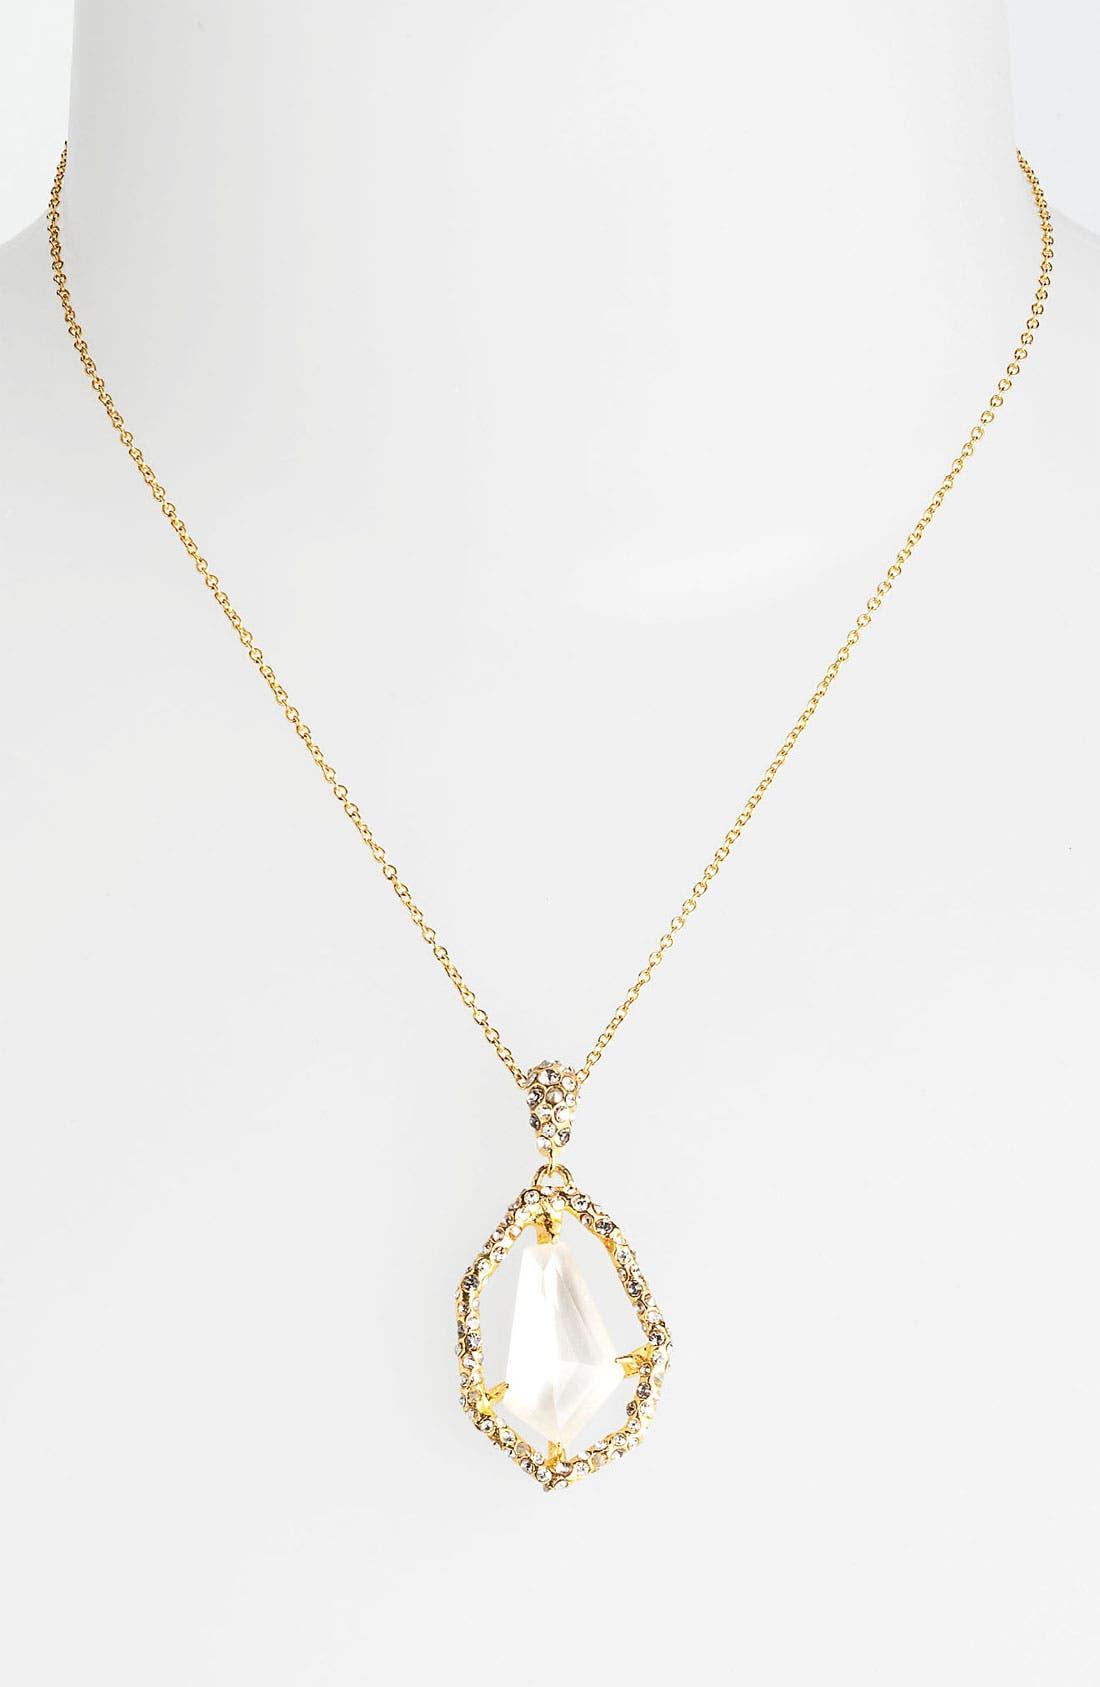 Alternate Image 1 Selected - Alexis Bittar 'Miss Havisham - Bel Air' Pendant Necklace